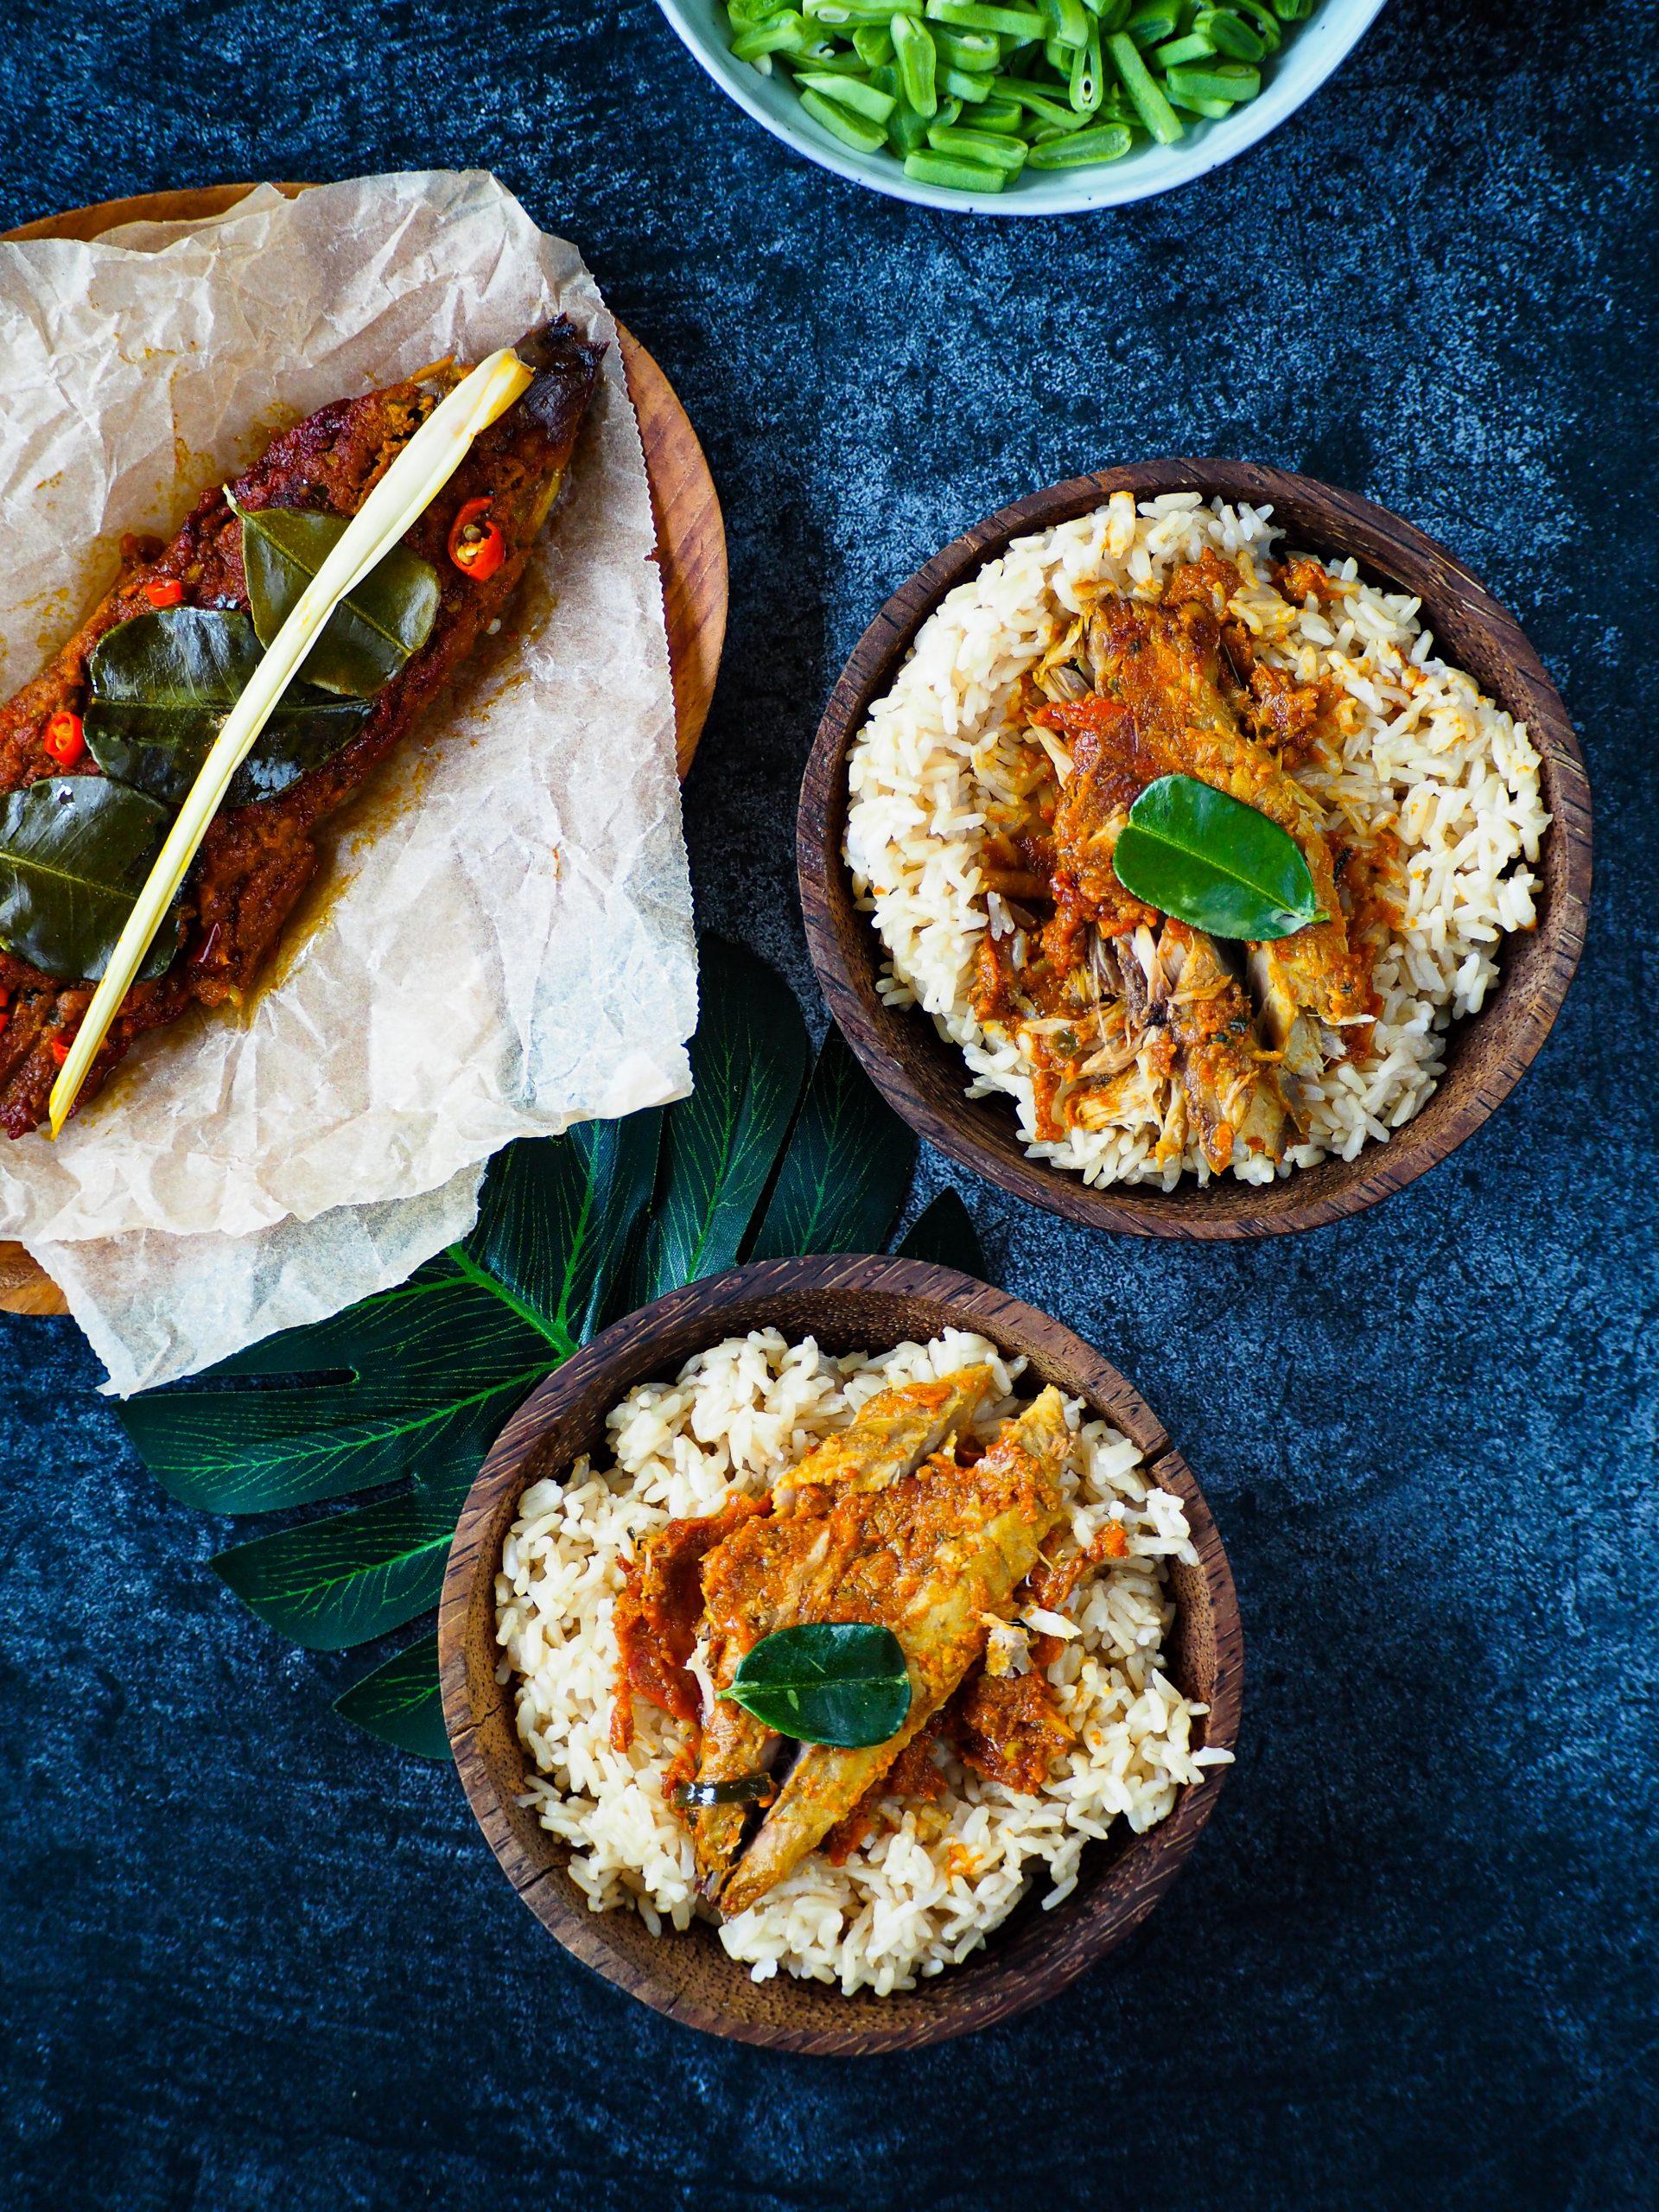 ikan pepesan met makreel en rijst